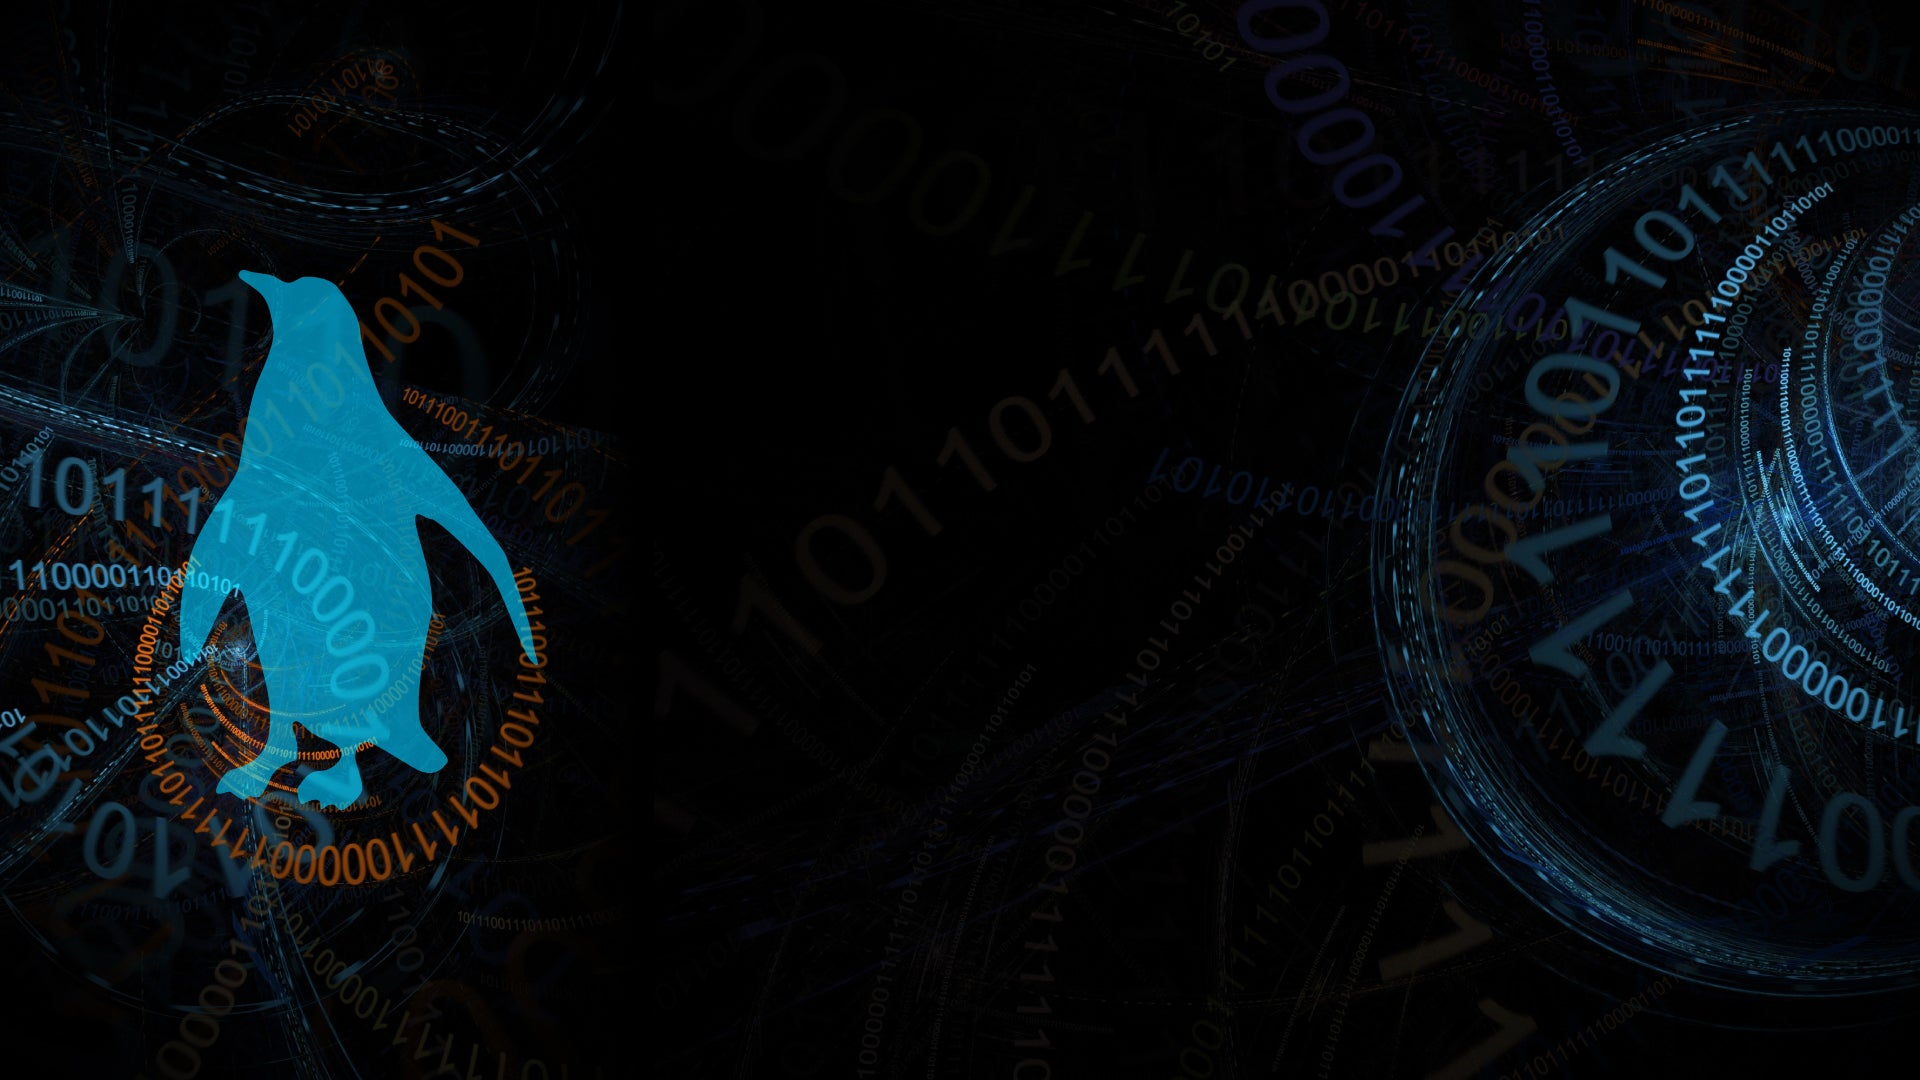 Network World - 2-Minute Linux Tips [video hero/video series]